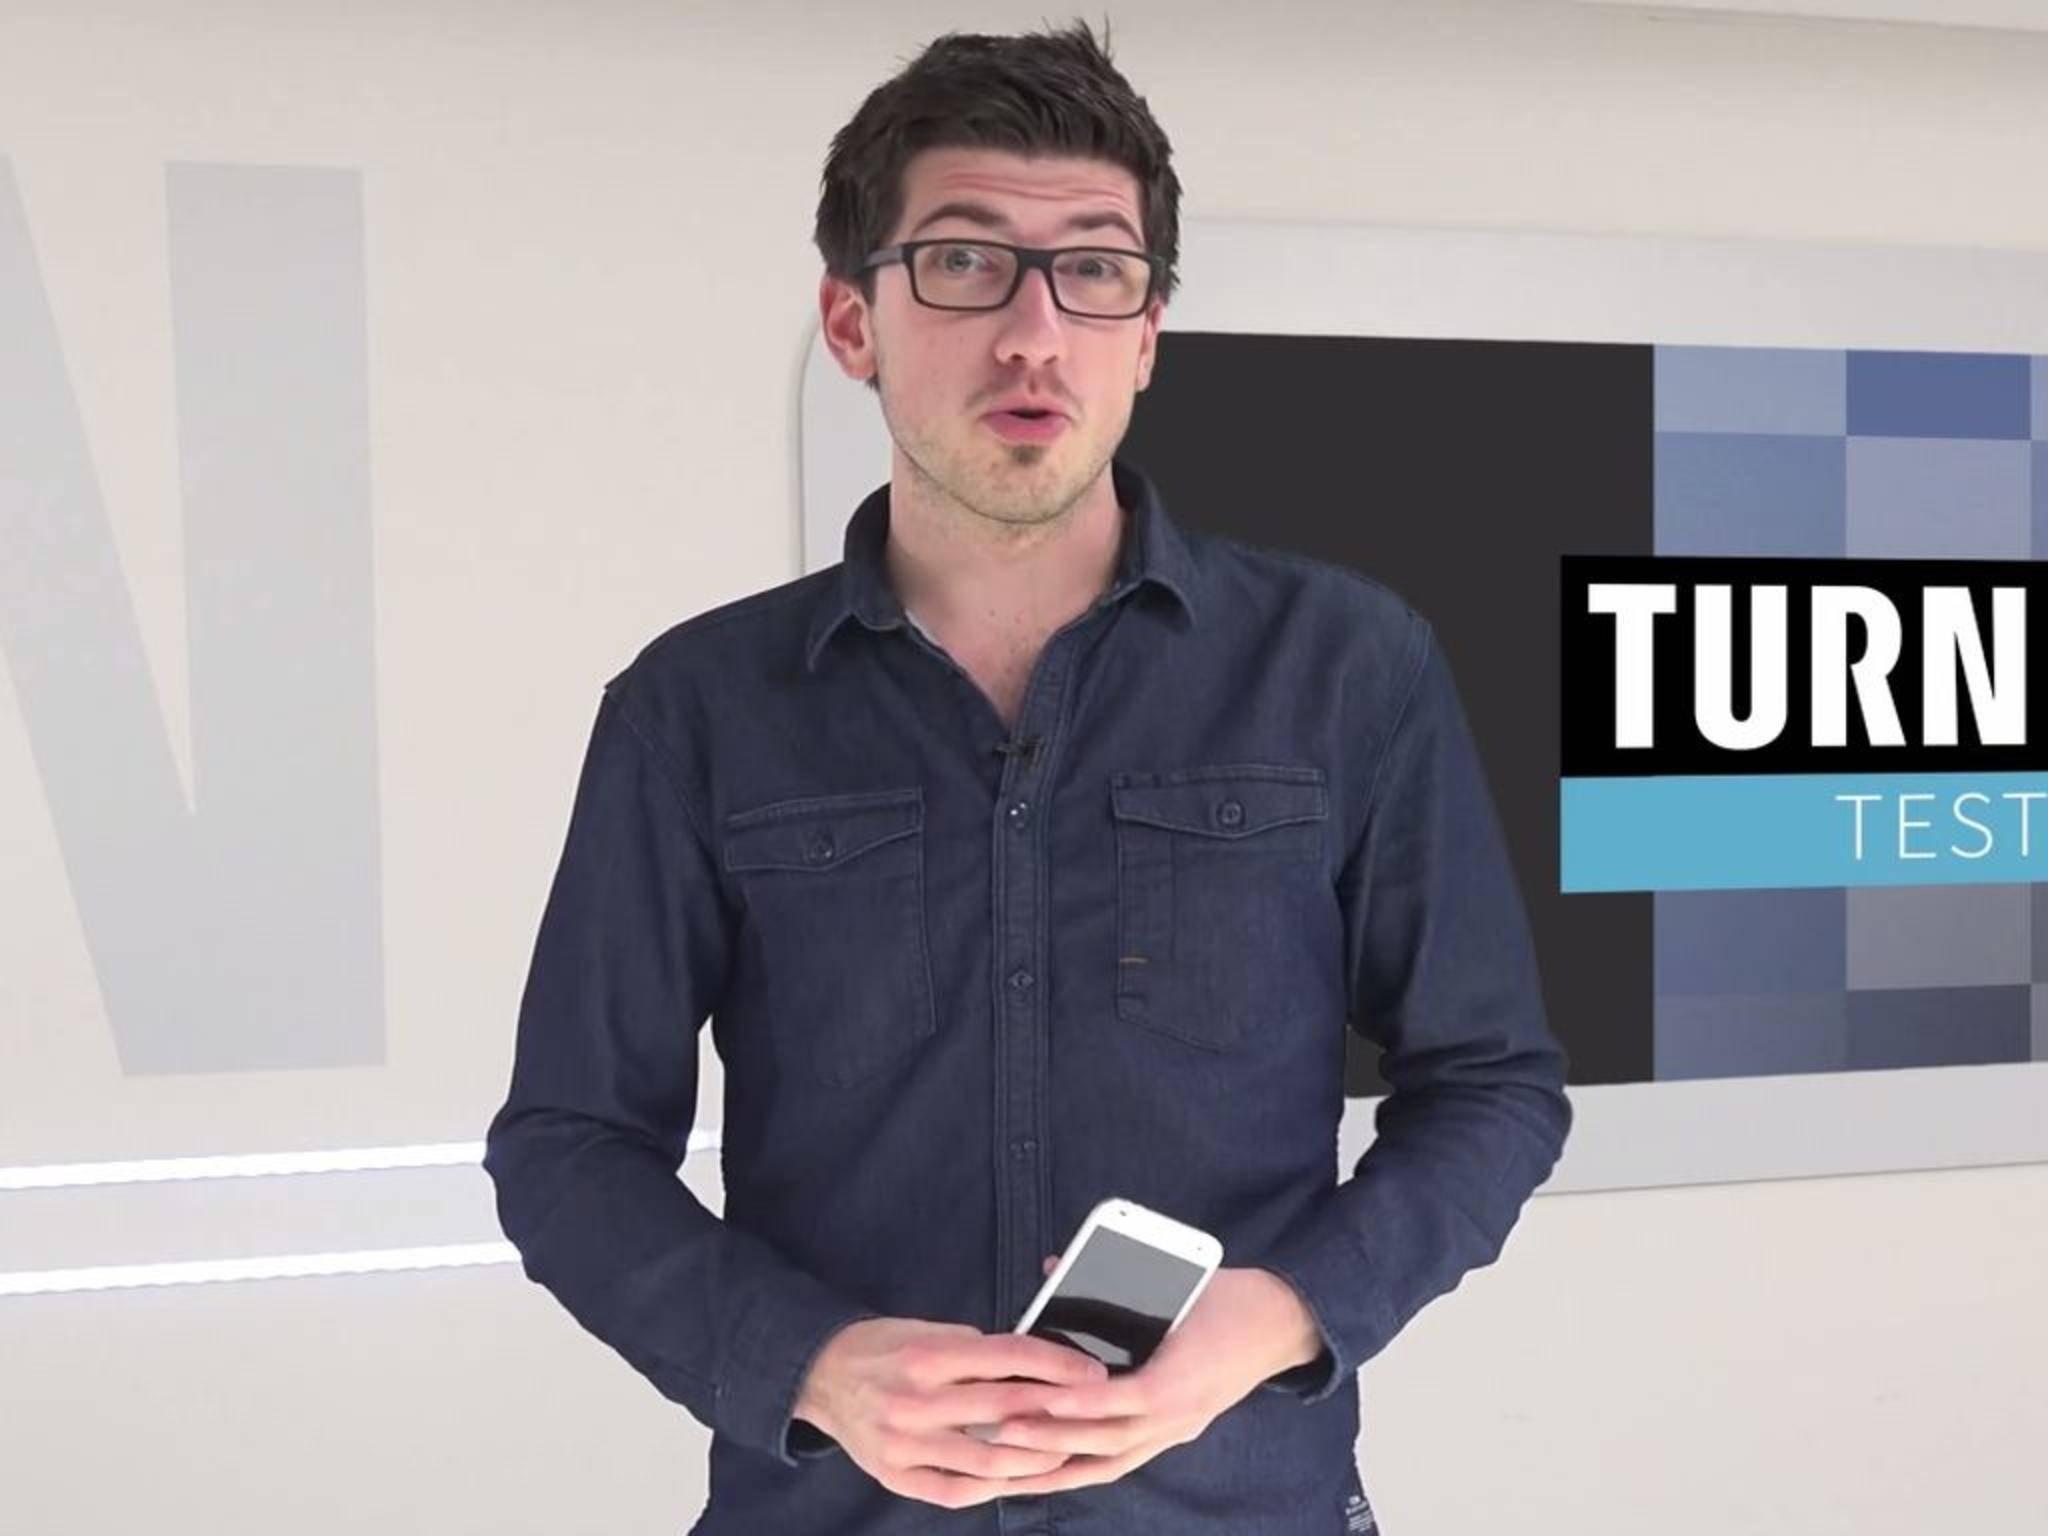 Alex testet das Huawei Ascend G7.